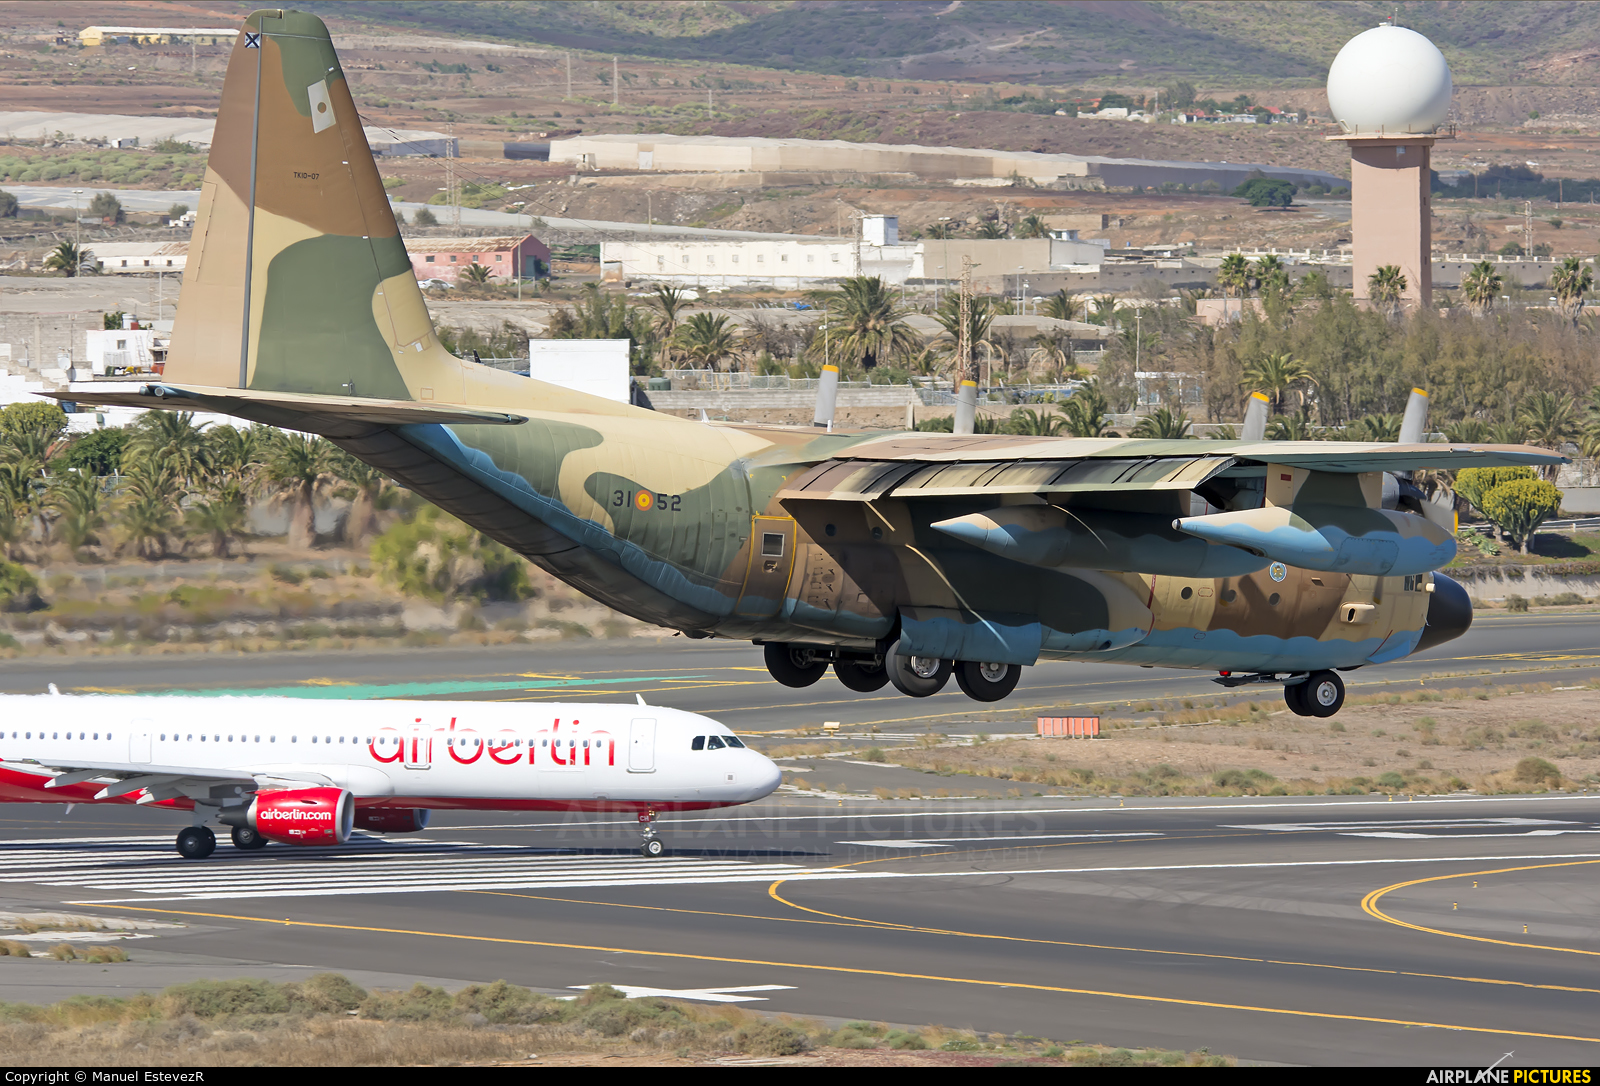 Spain - Air Force TK.10-07 aircraft at Aeropuerto de Gran Canaria